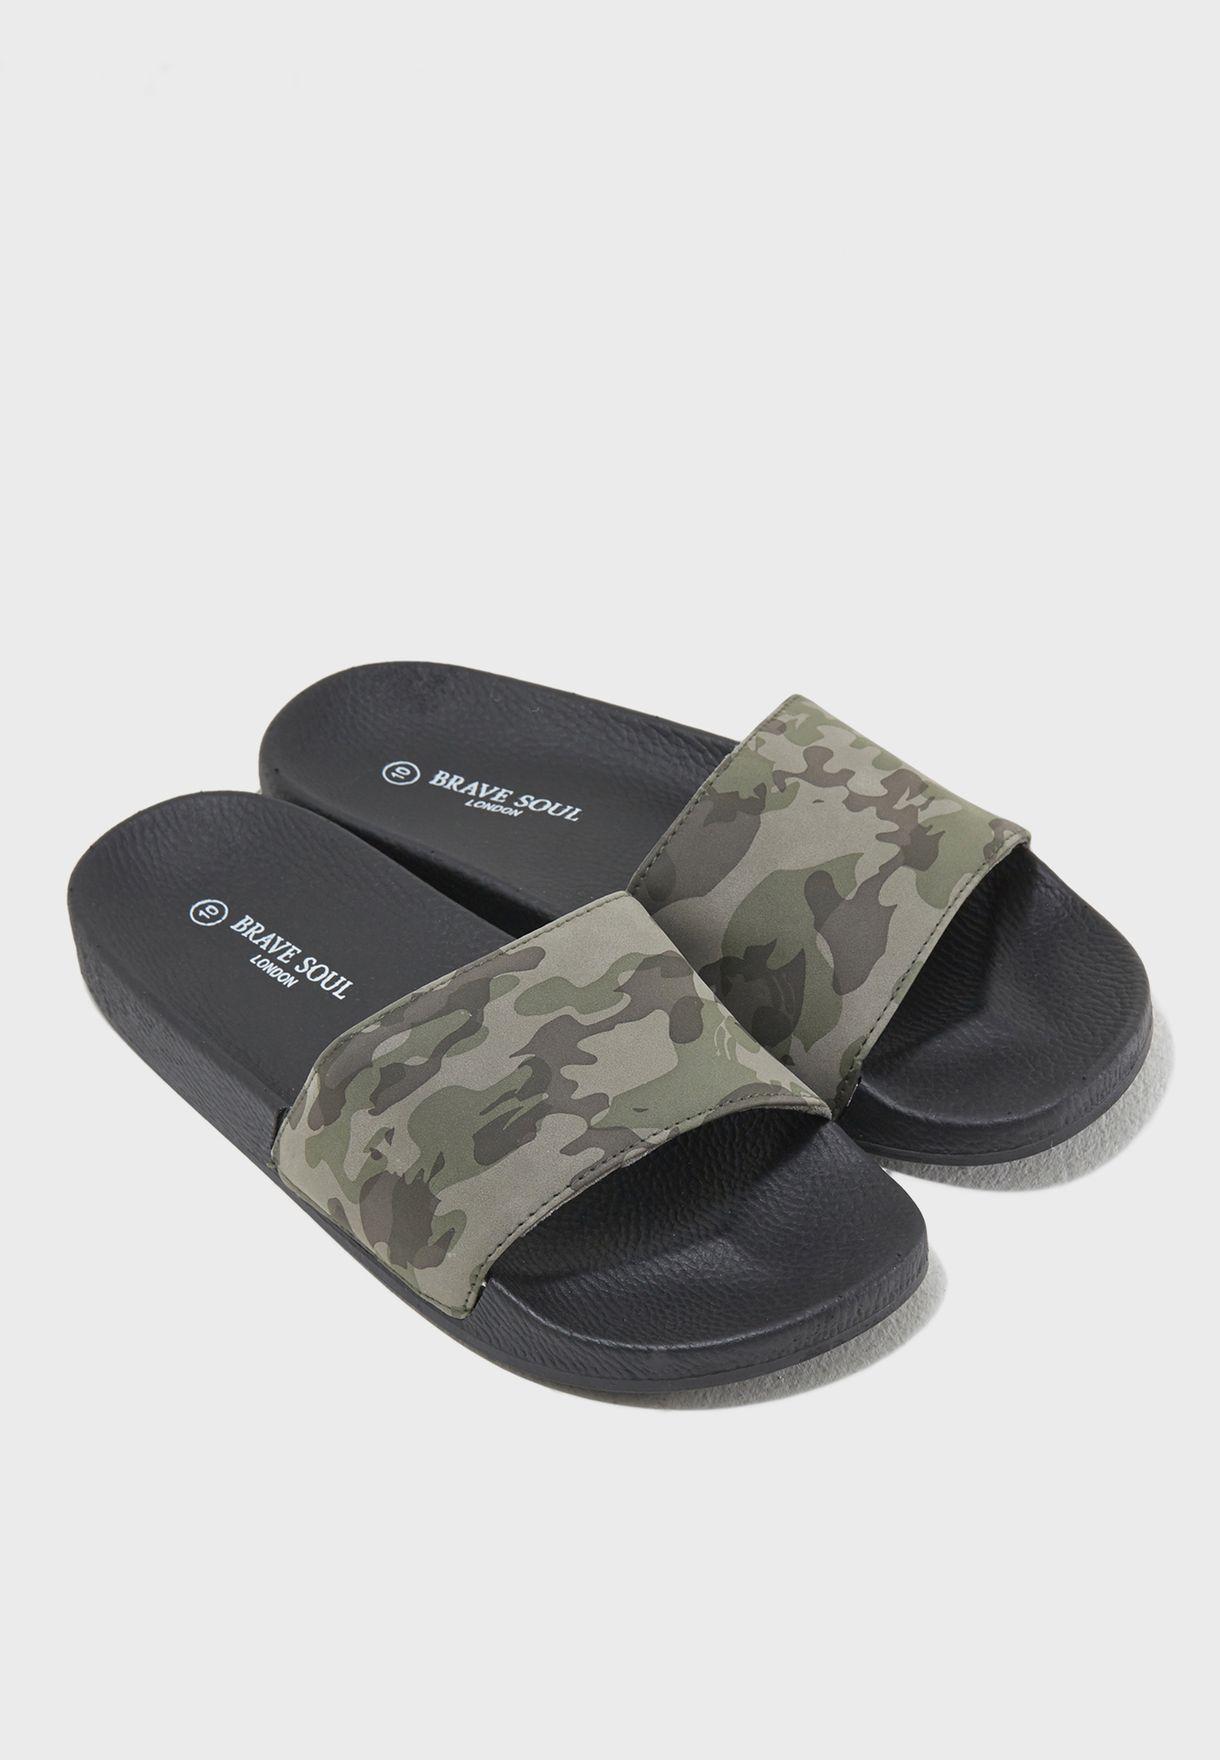 Gator Sandals